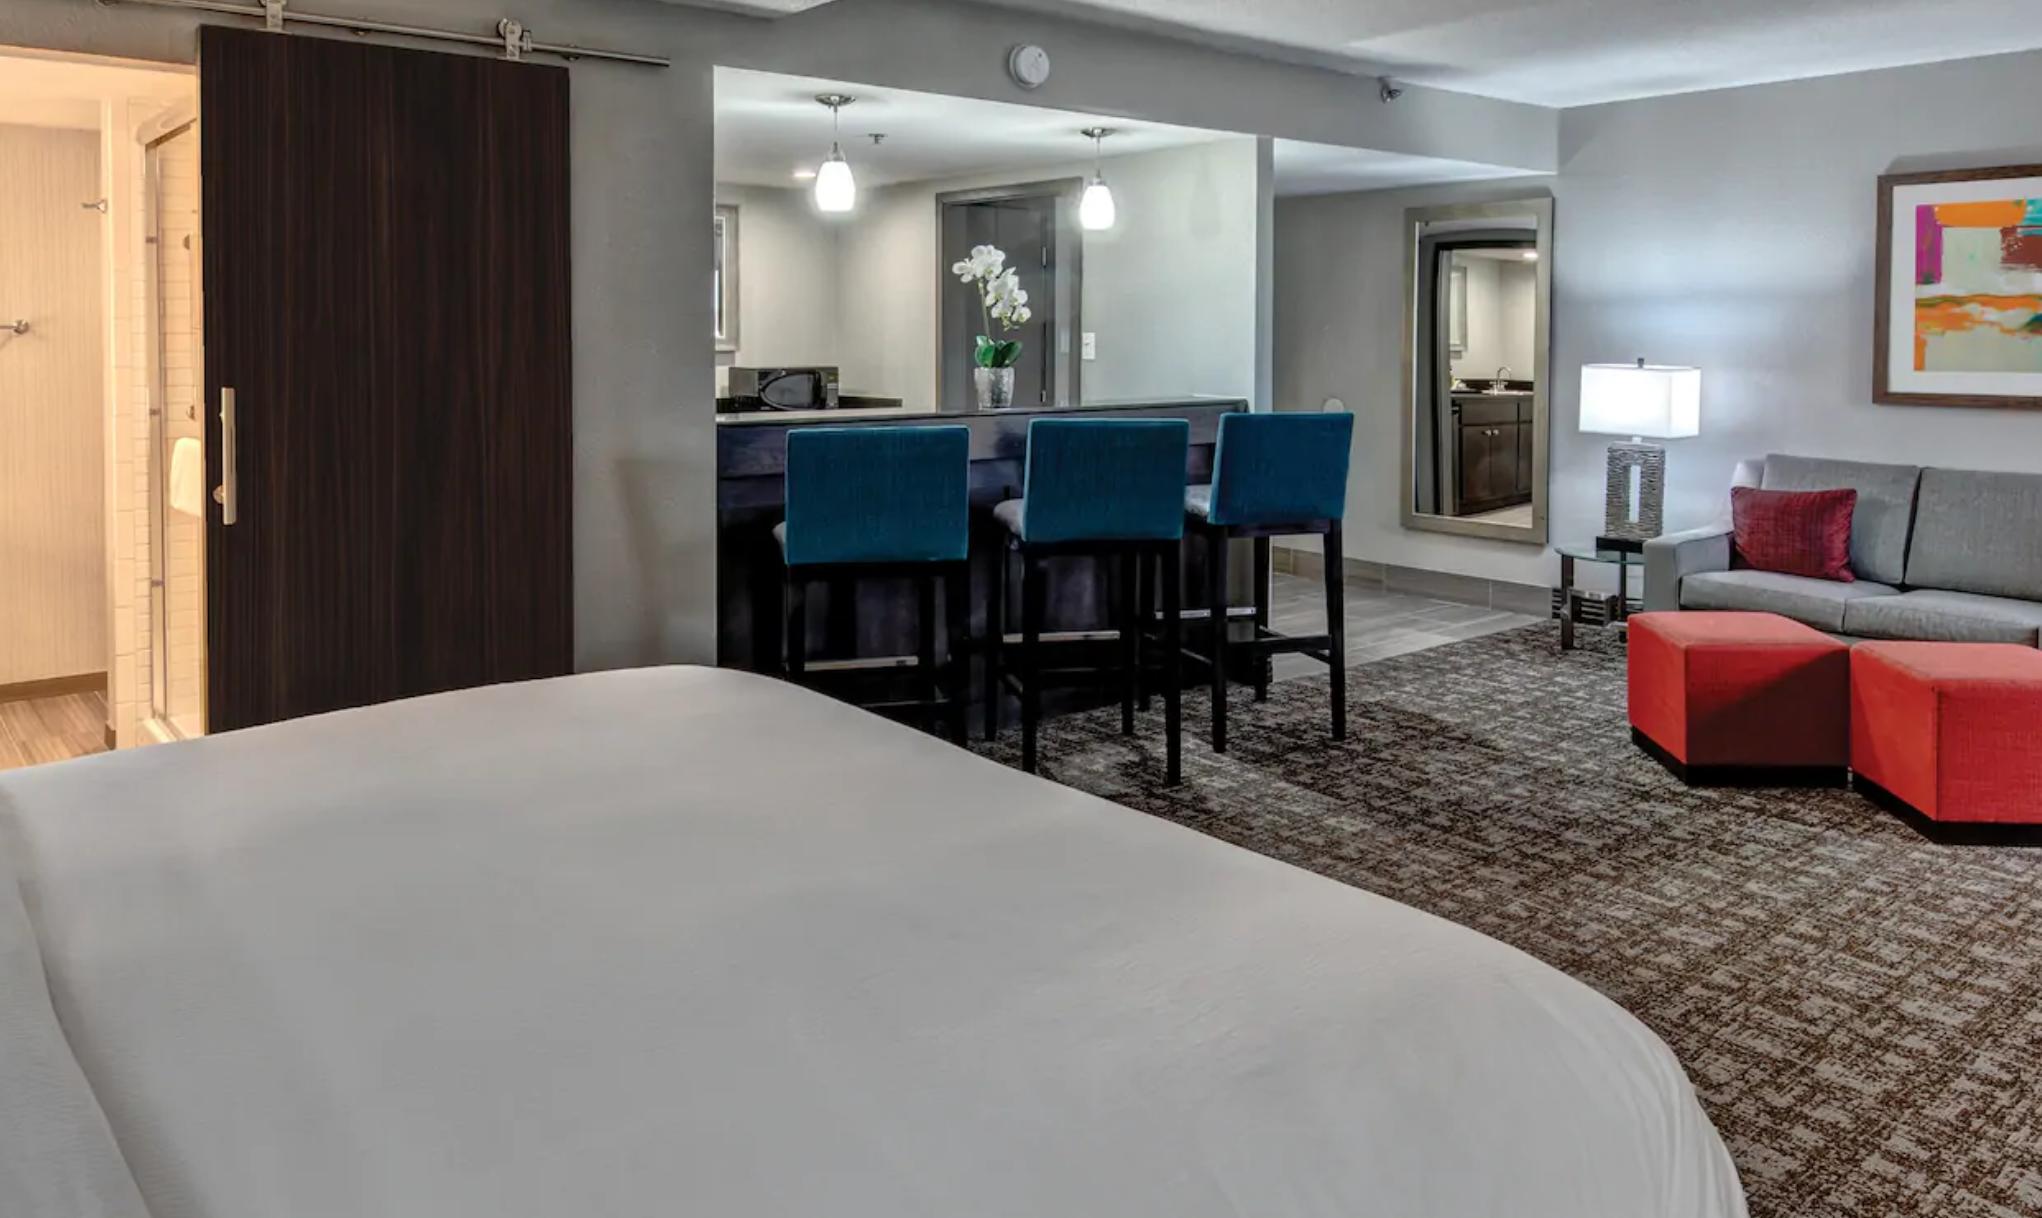 https://www.hotelsbyday.com/_data/default-hotel_image/3/19330/screenshot-2020-07-02-at-3-43-45-pm.png